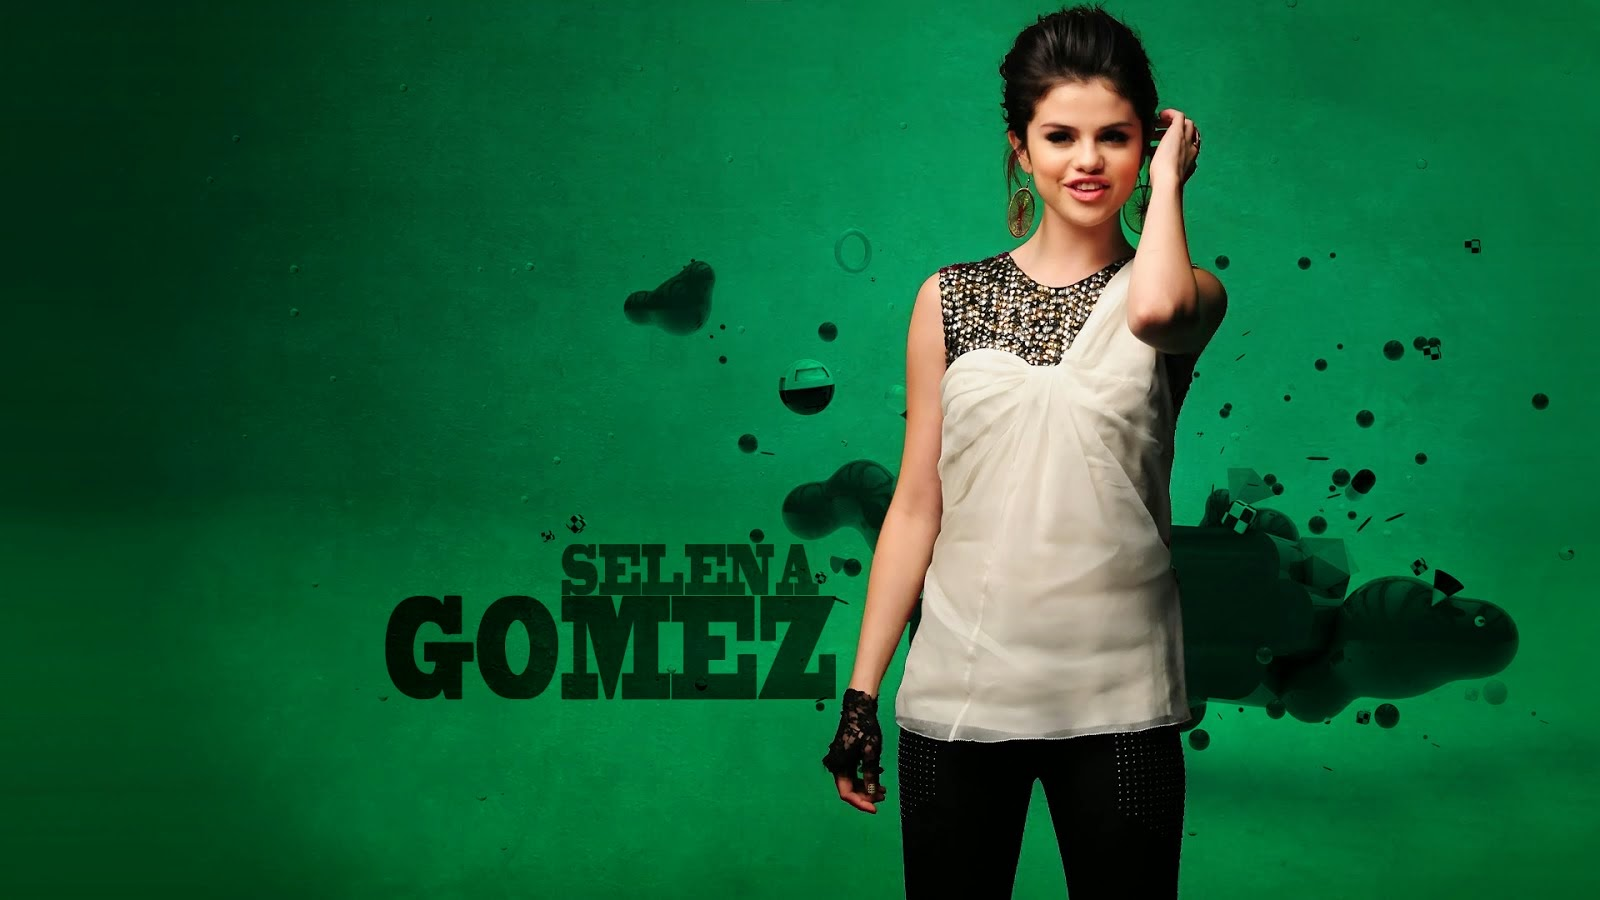 Selena Gomez Wallpapers Download High Definition Desktop 1600x900